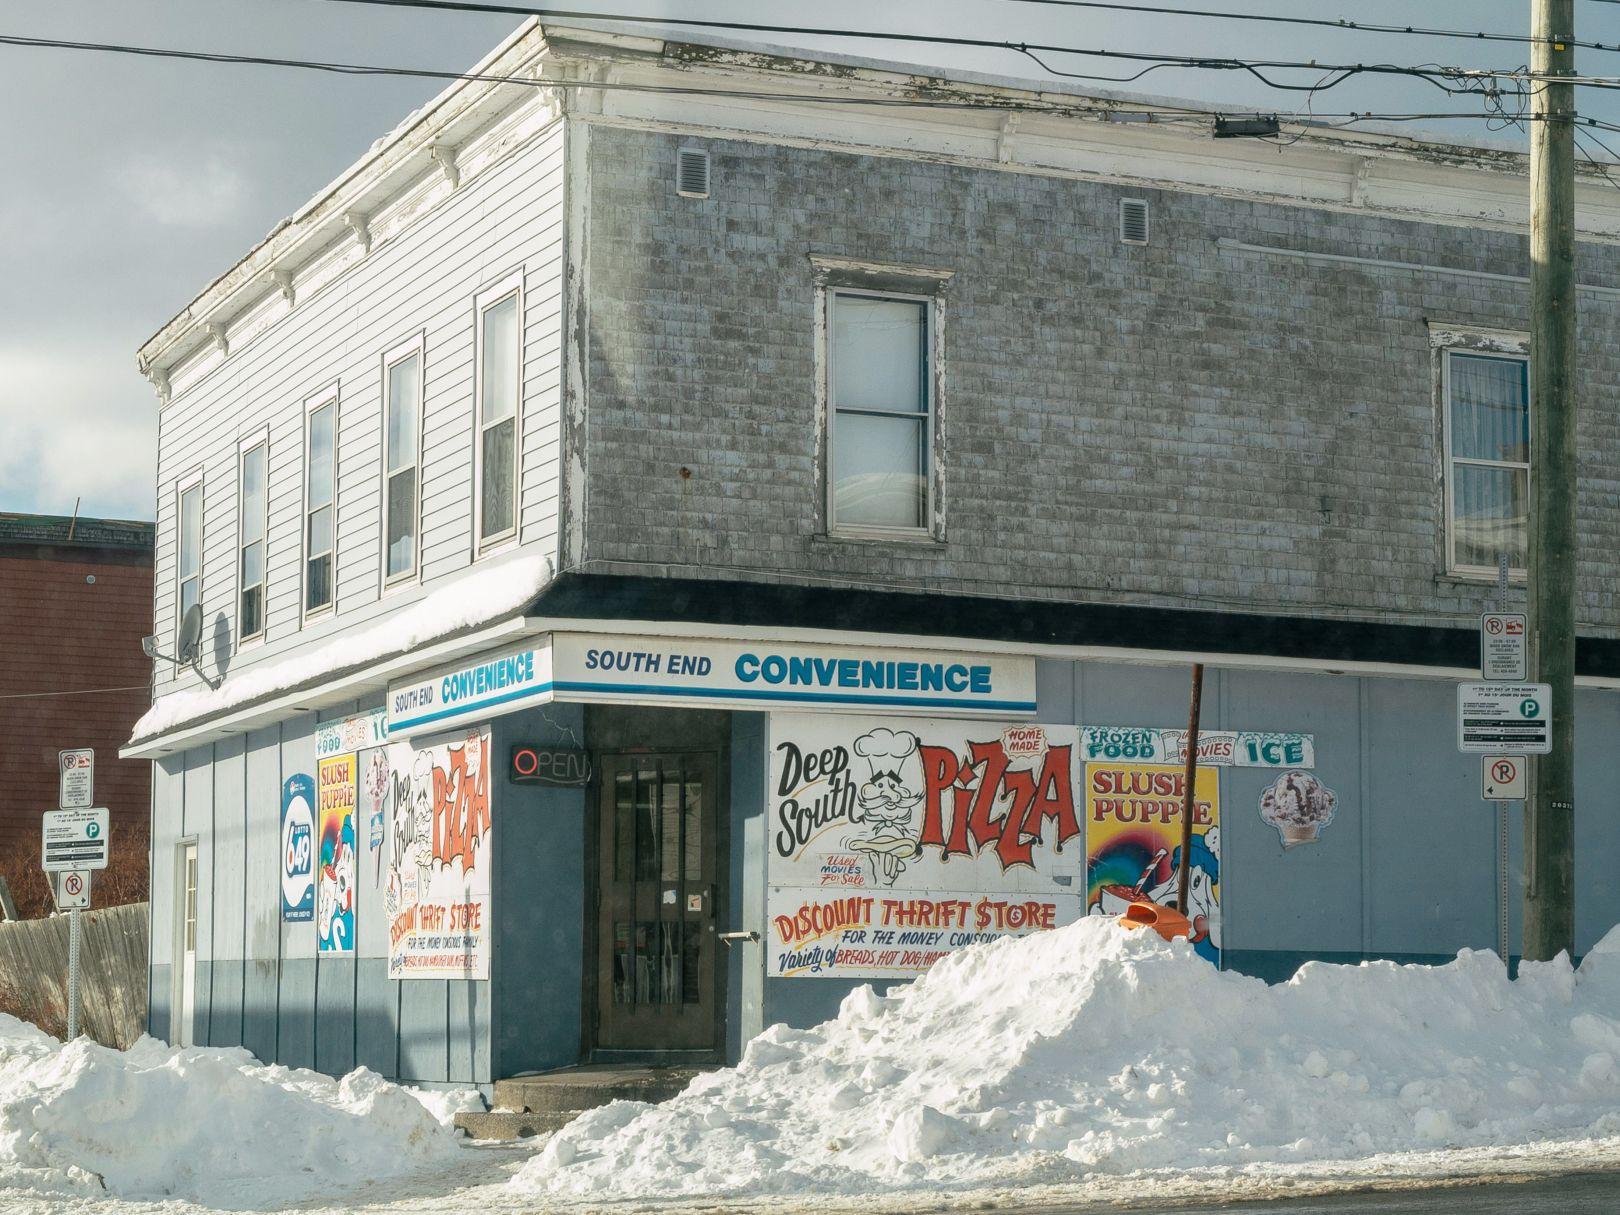 A photo of South End Convenience Snow Bank Saint John Nb Photograph